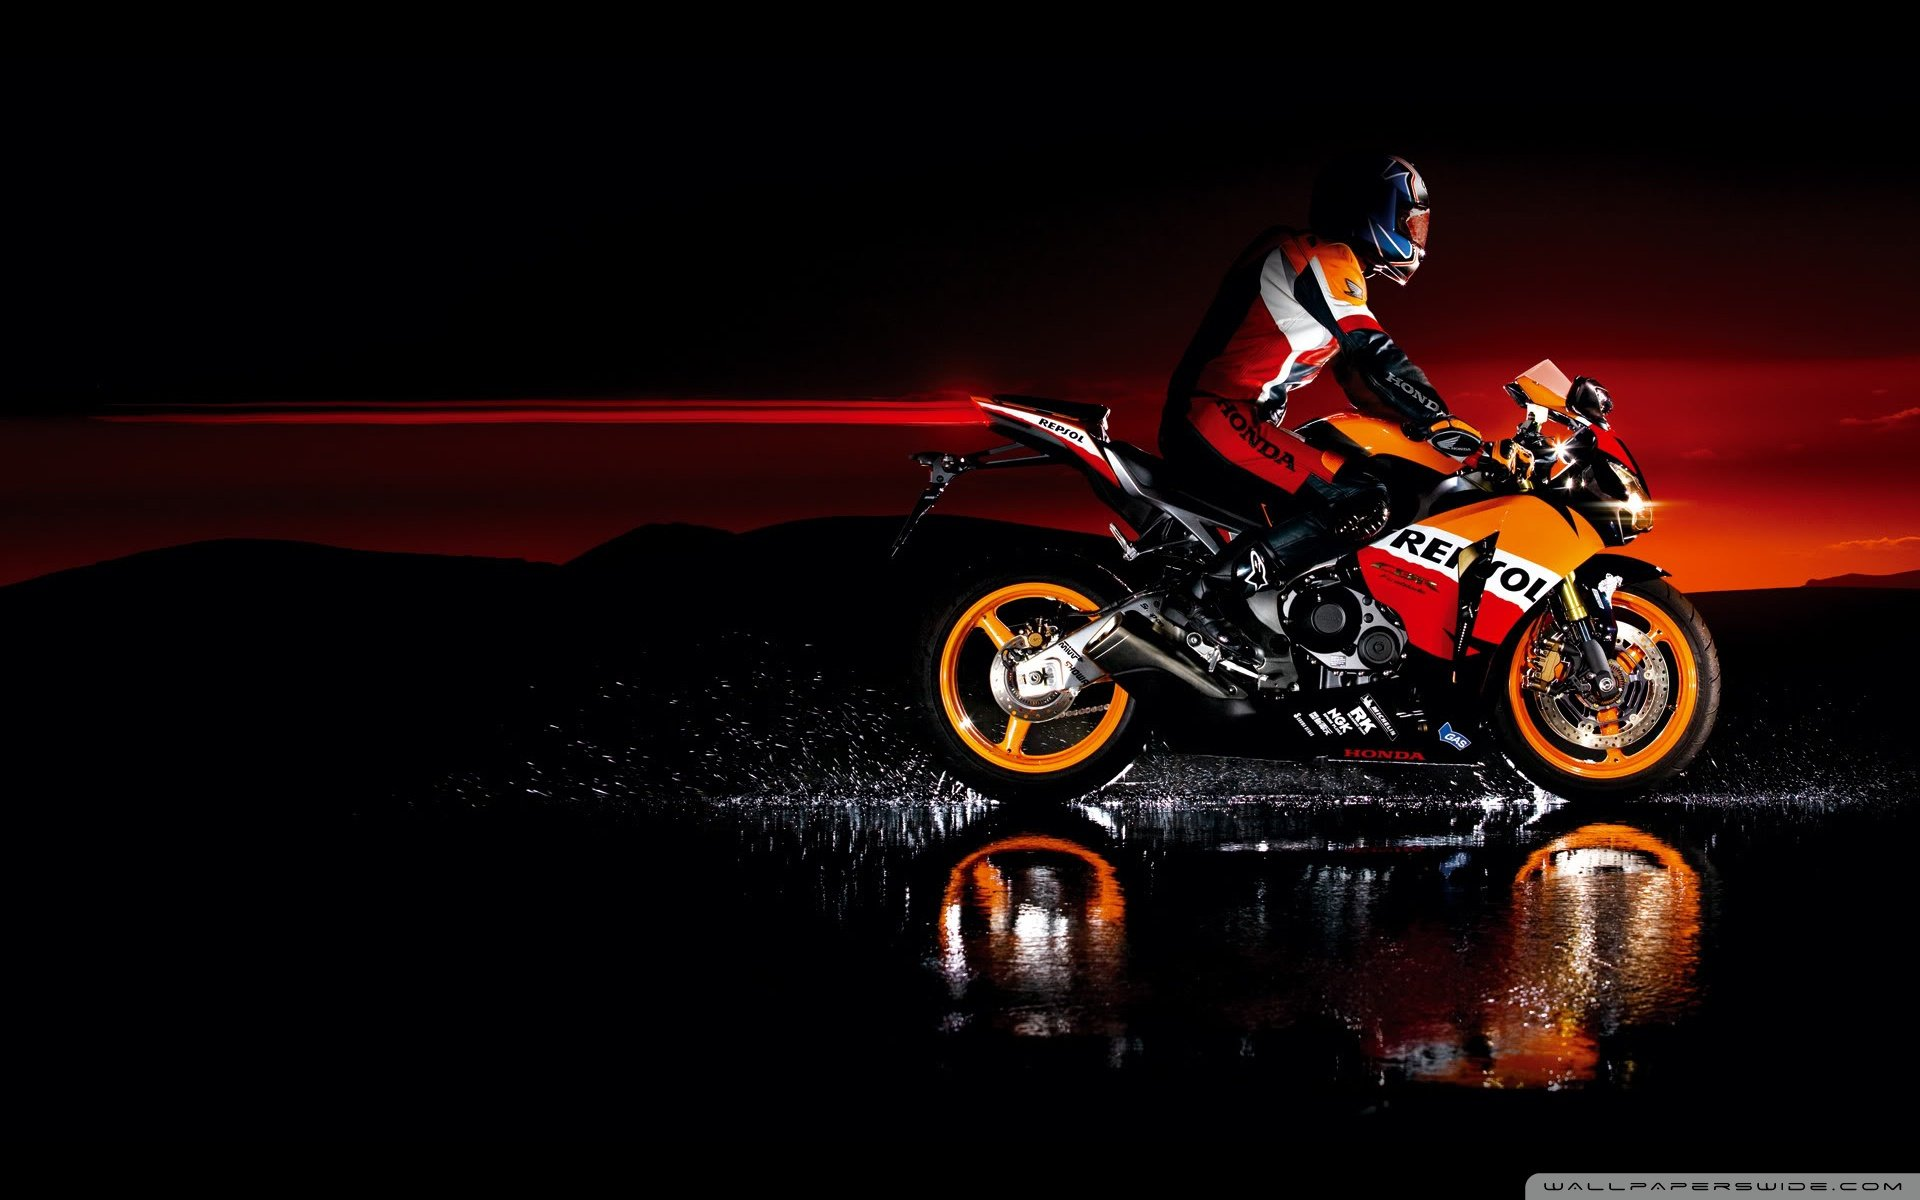 Honda Cbr Motorcycle 4k Hd Desktop Wallpaper For 4k Ultra: MotoGP Wallpaper Widescreen